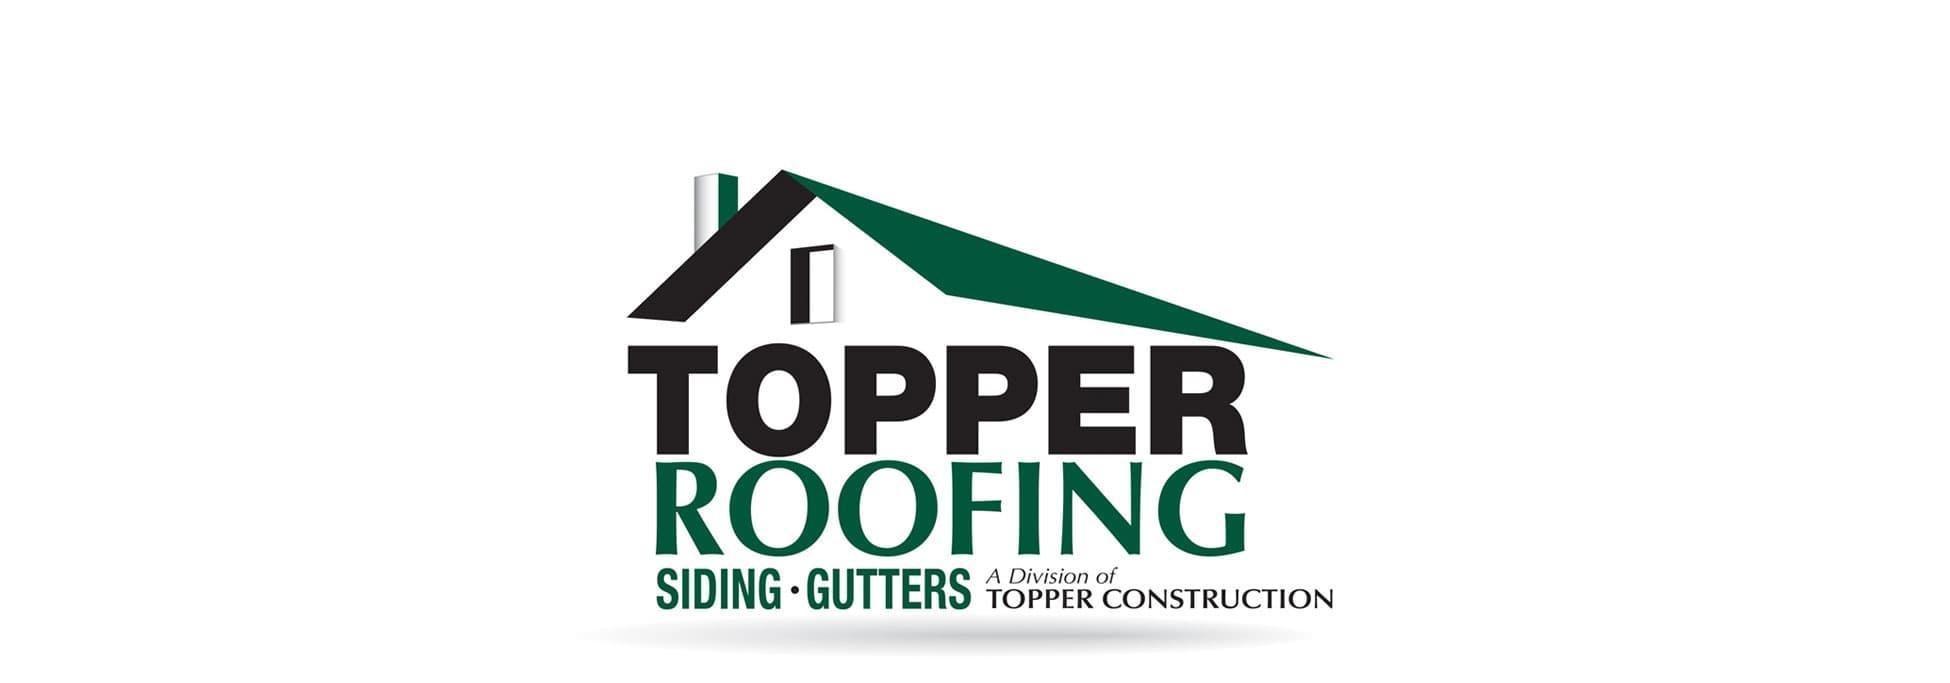 Topper Roofing Logo